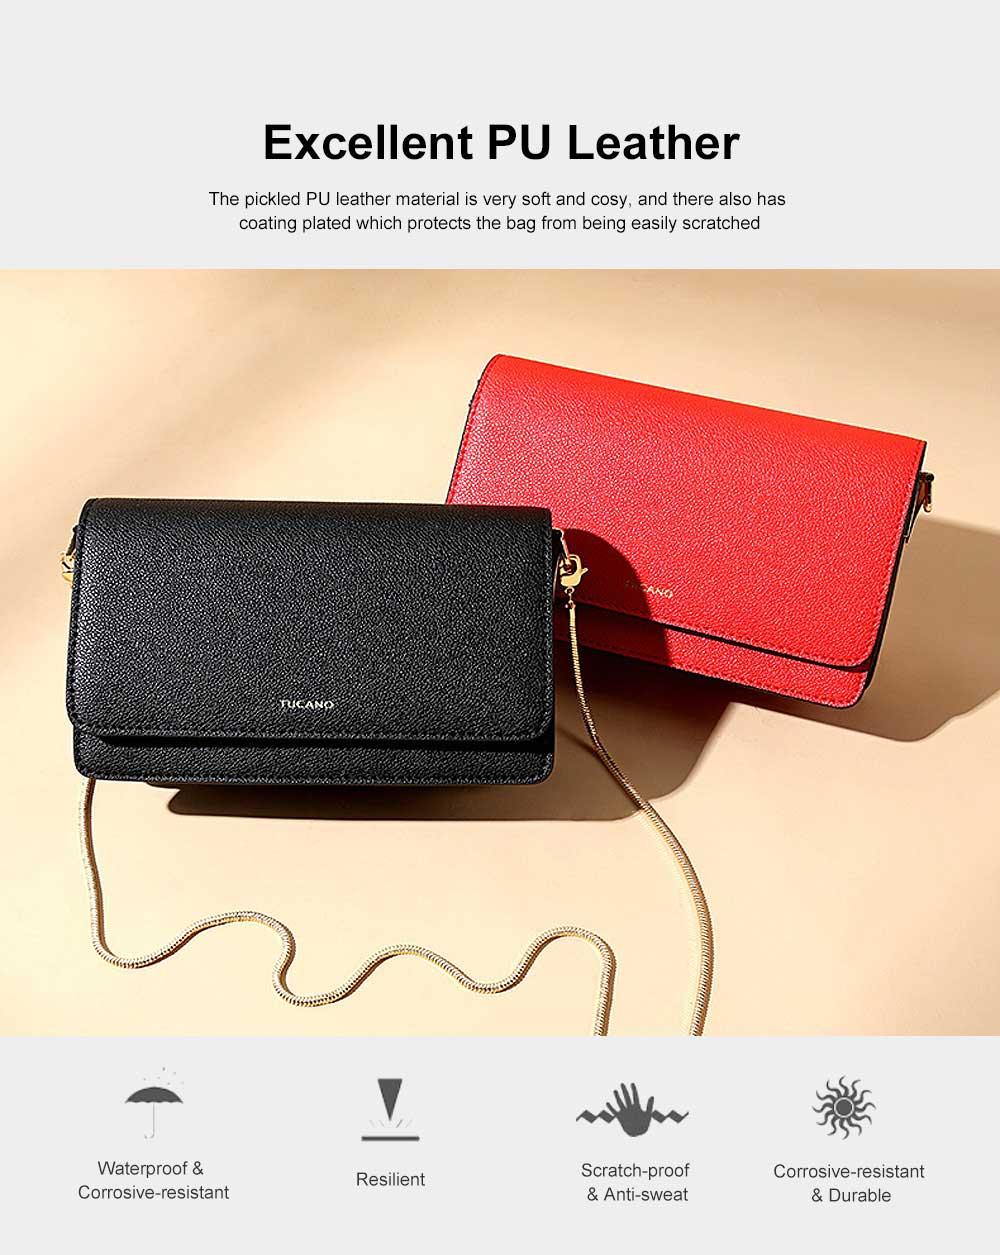 Small Messenger Bags for Women, Crossbody Bag Chain Shoulder Evening Clutch Purse Formal Bag 1